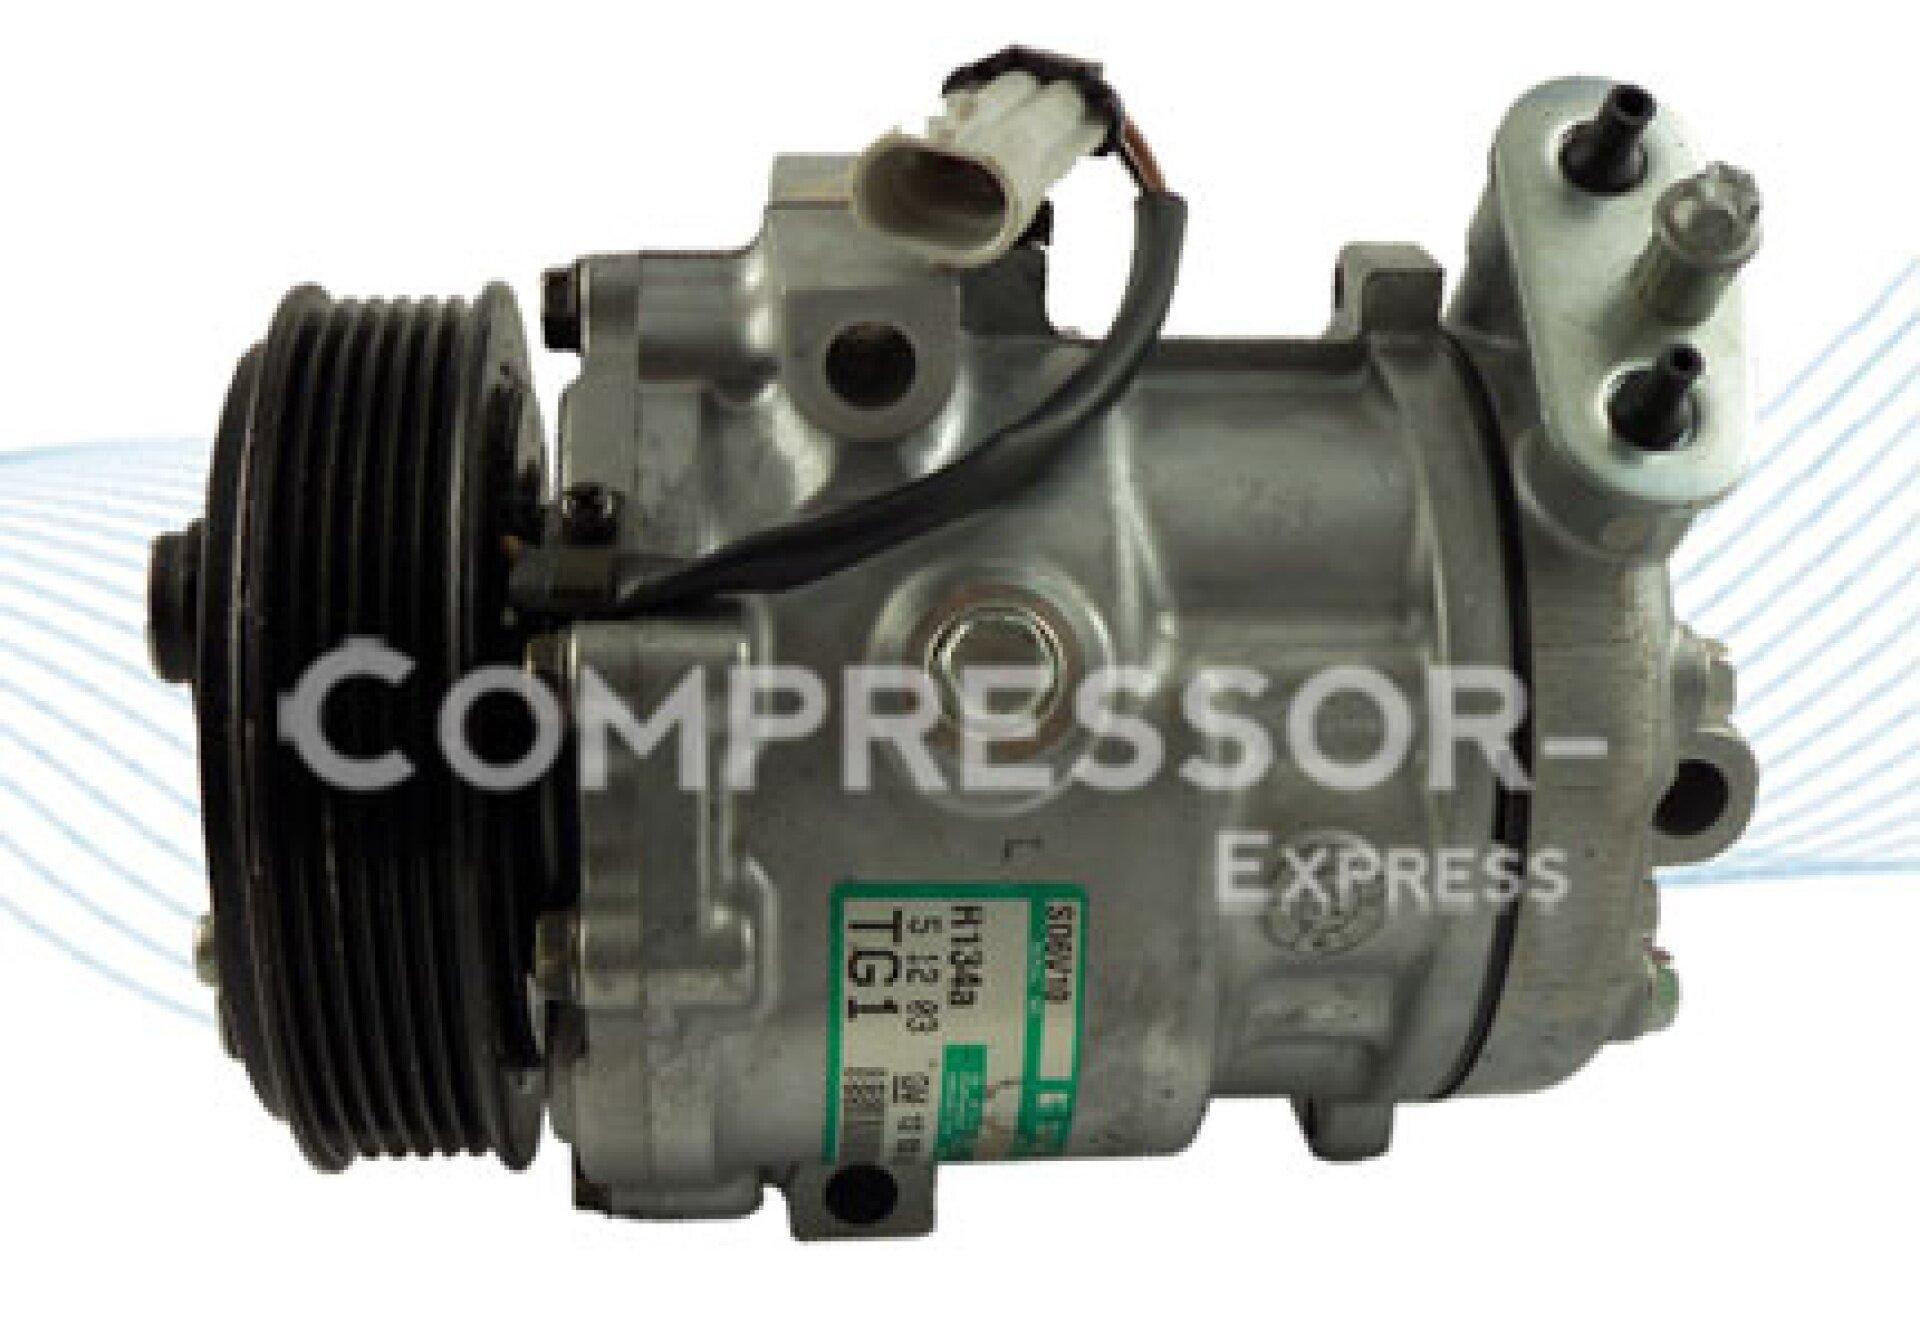 Compressor Express Kompresor Suzuki Escudo 20 Seiko Seiki Opel 01 6v10 Pv6